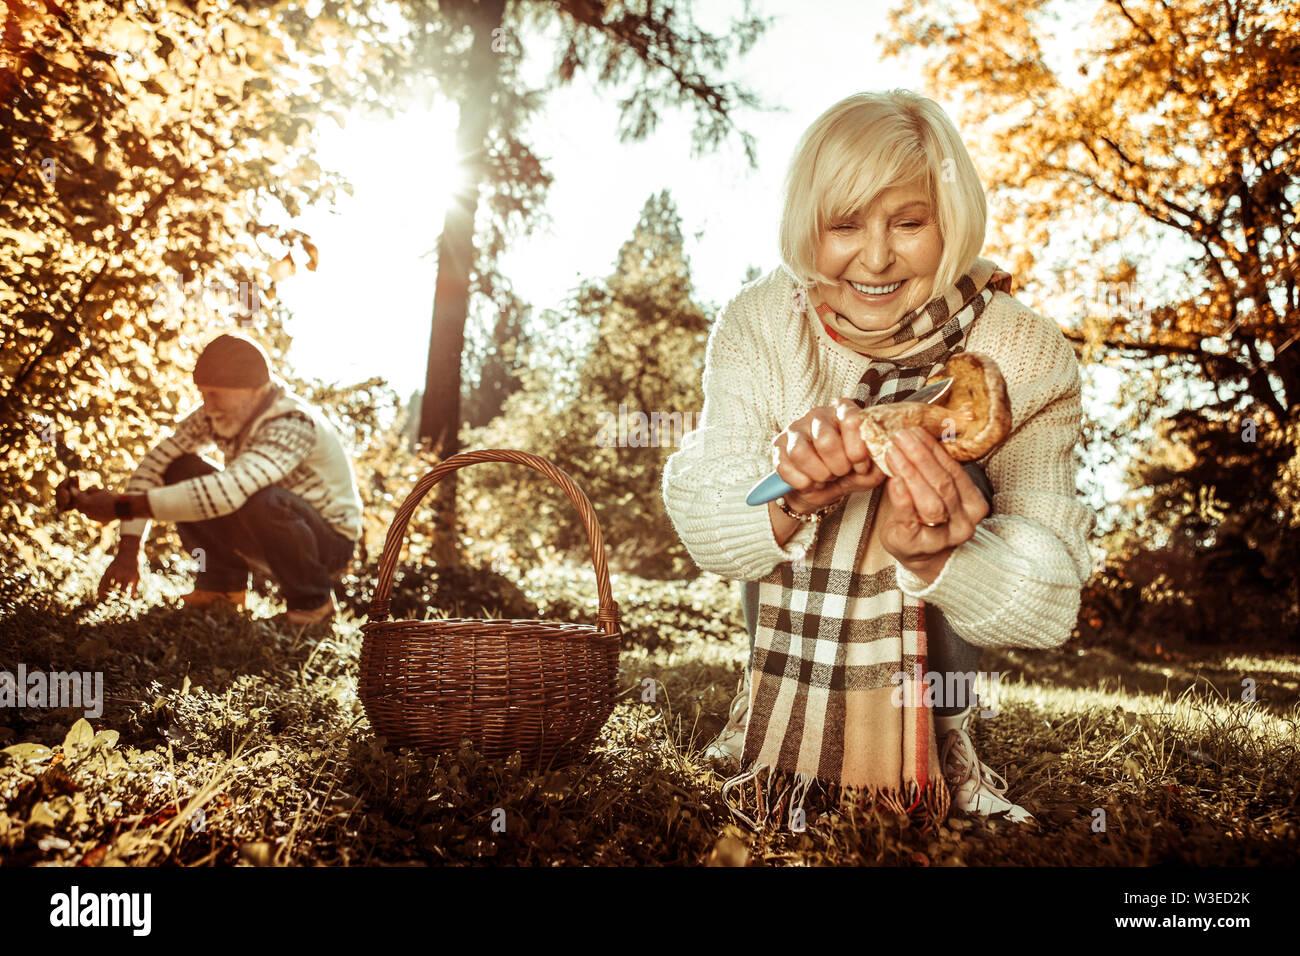 Smiling woman cutting un stipe d'un champignon. Photo Stock